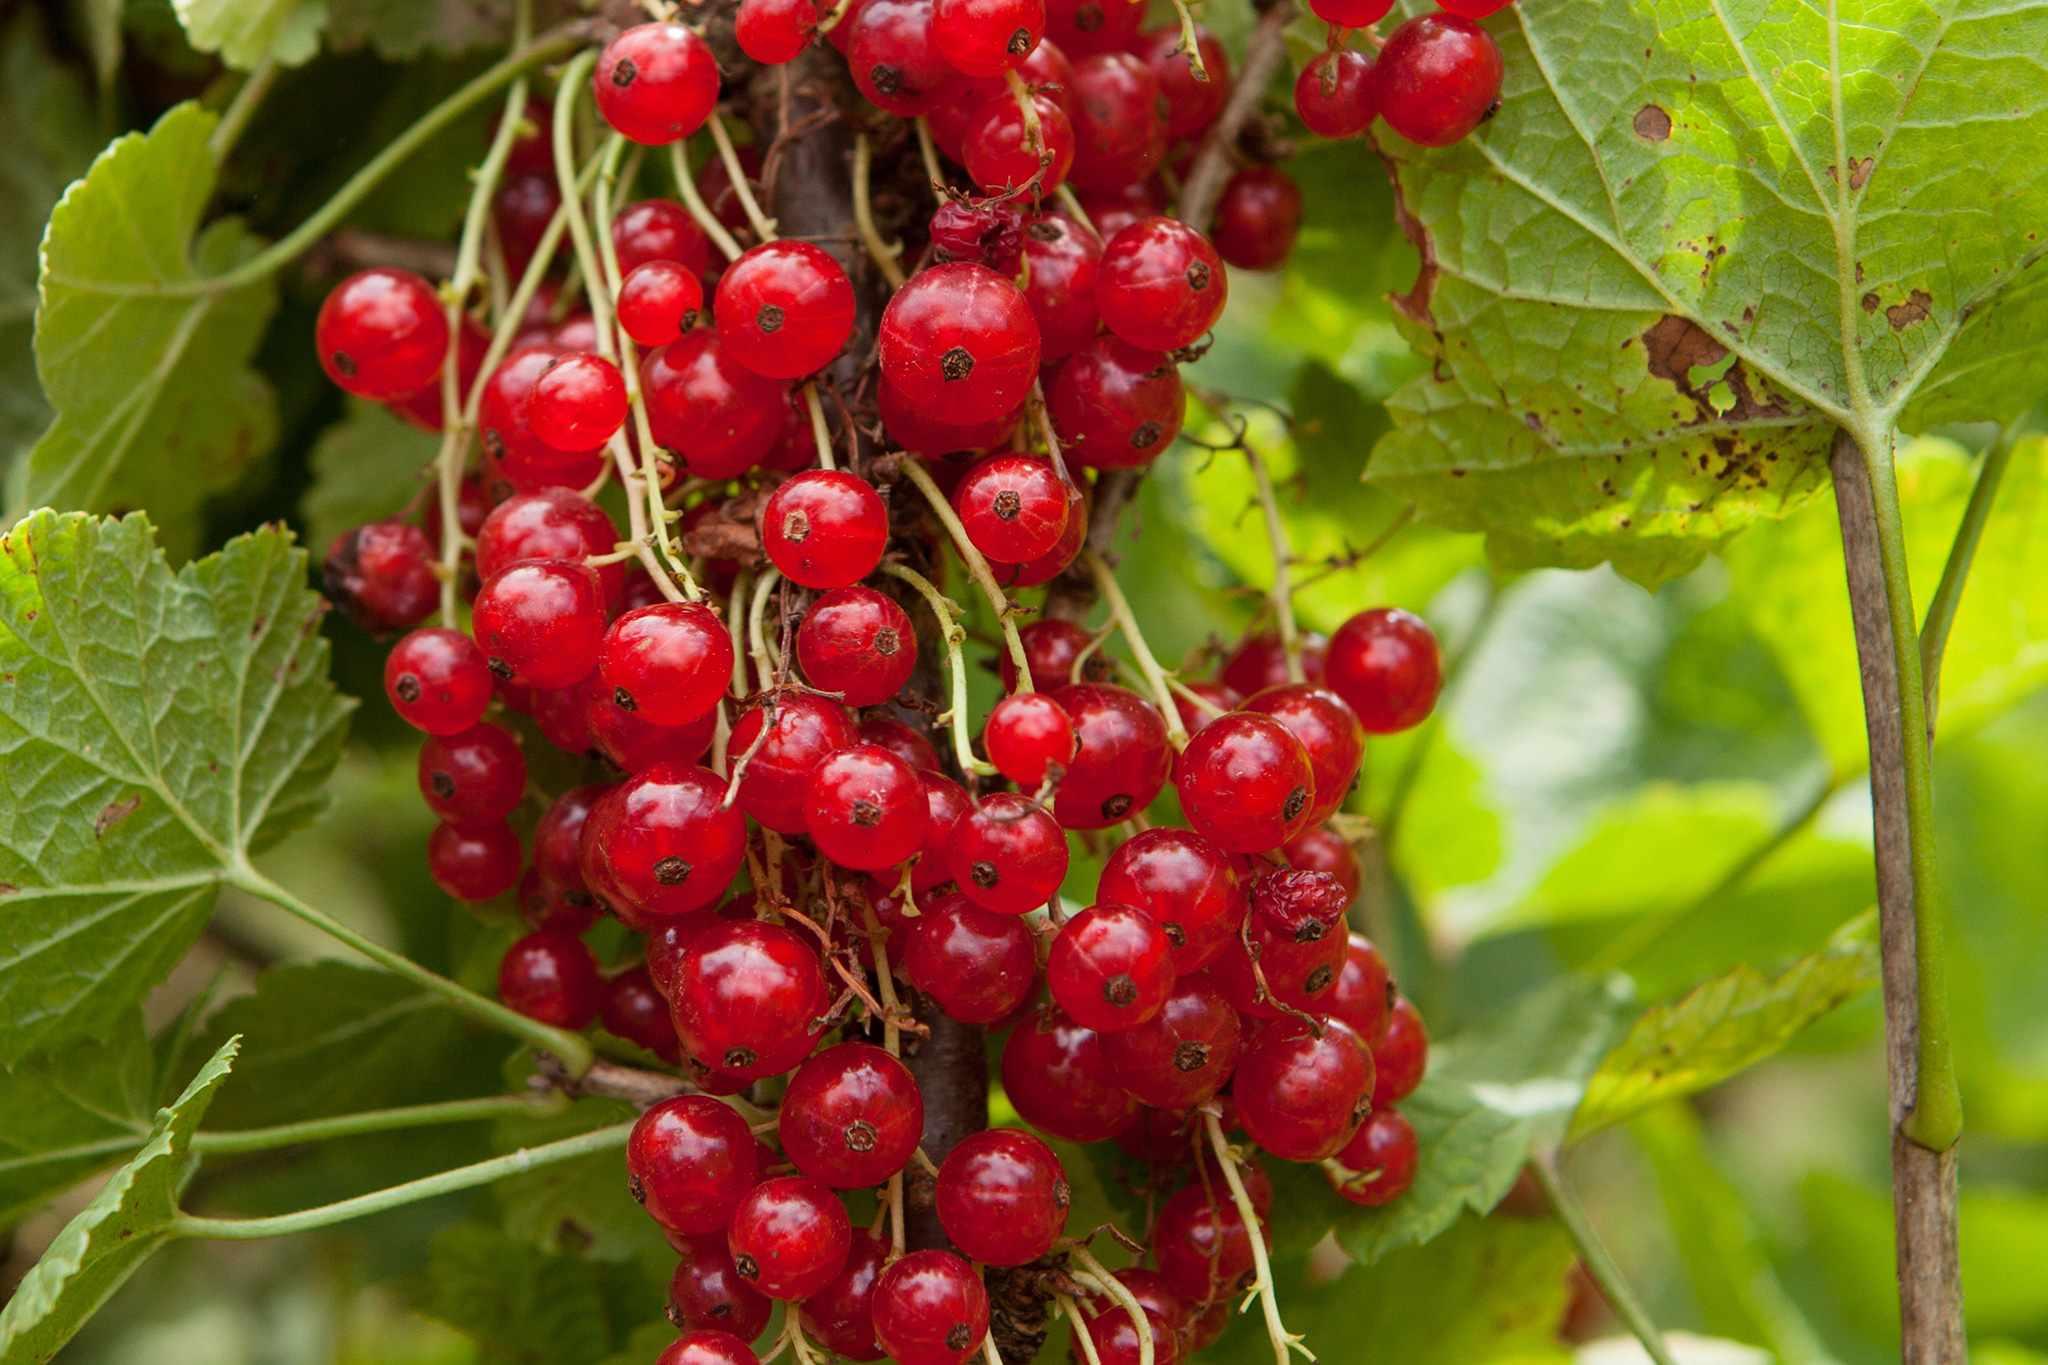 Redcurrants on bush